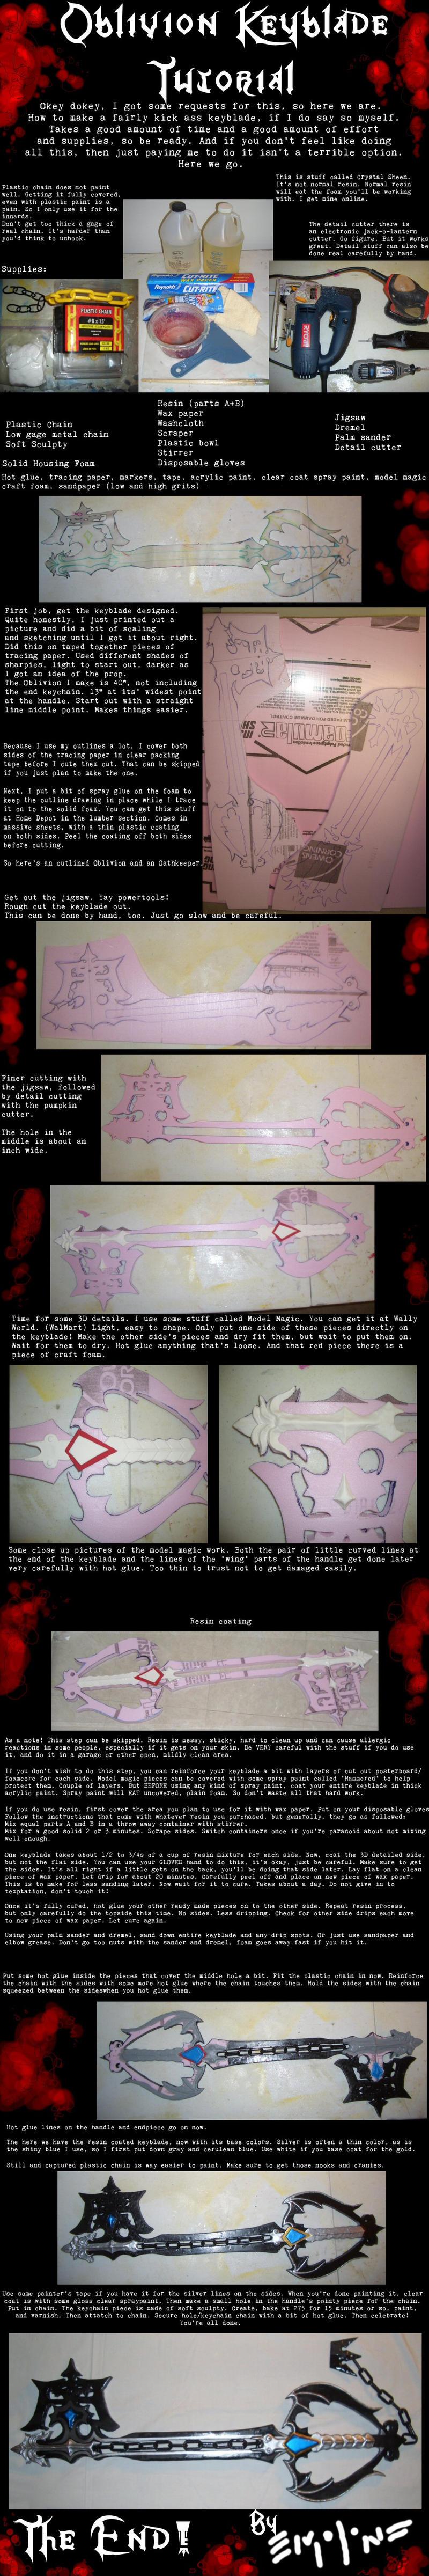 Terkini Oblivion Keyblade Tutorial